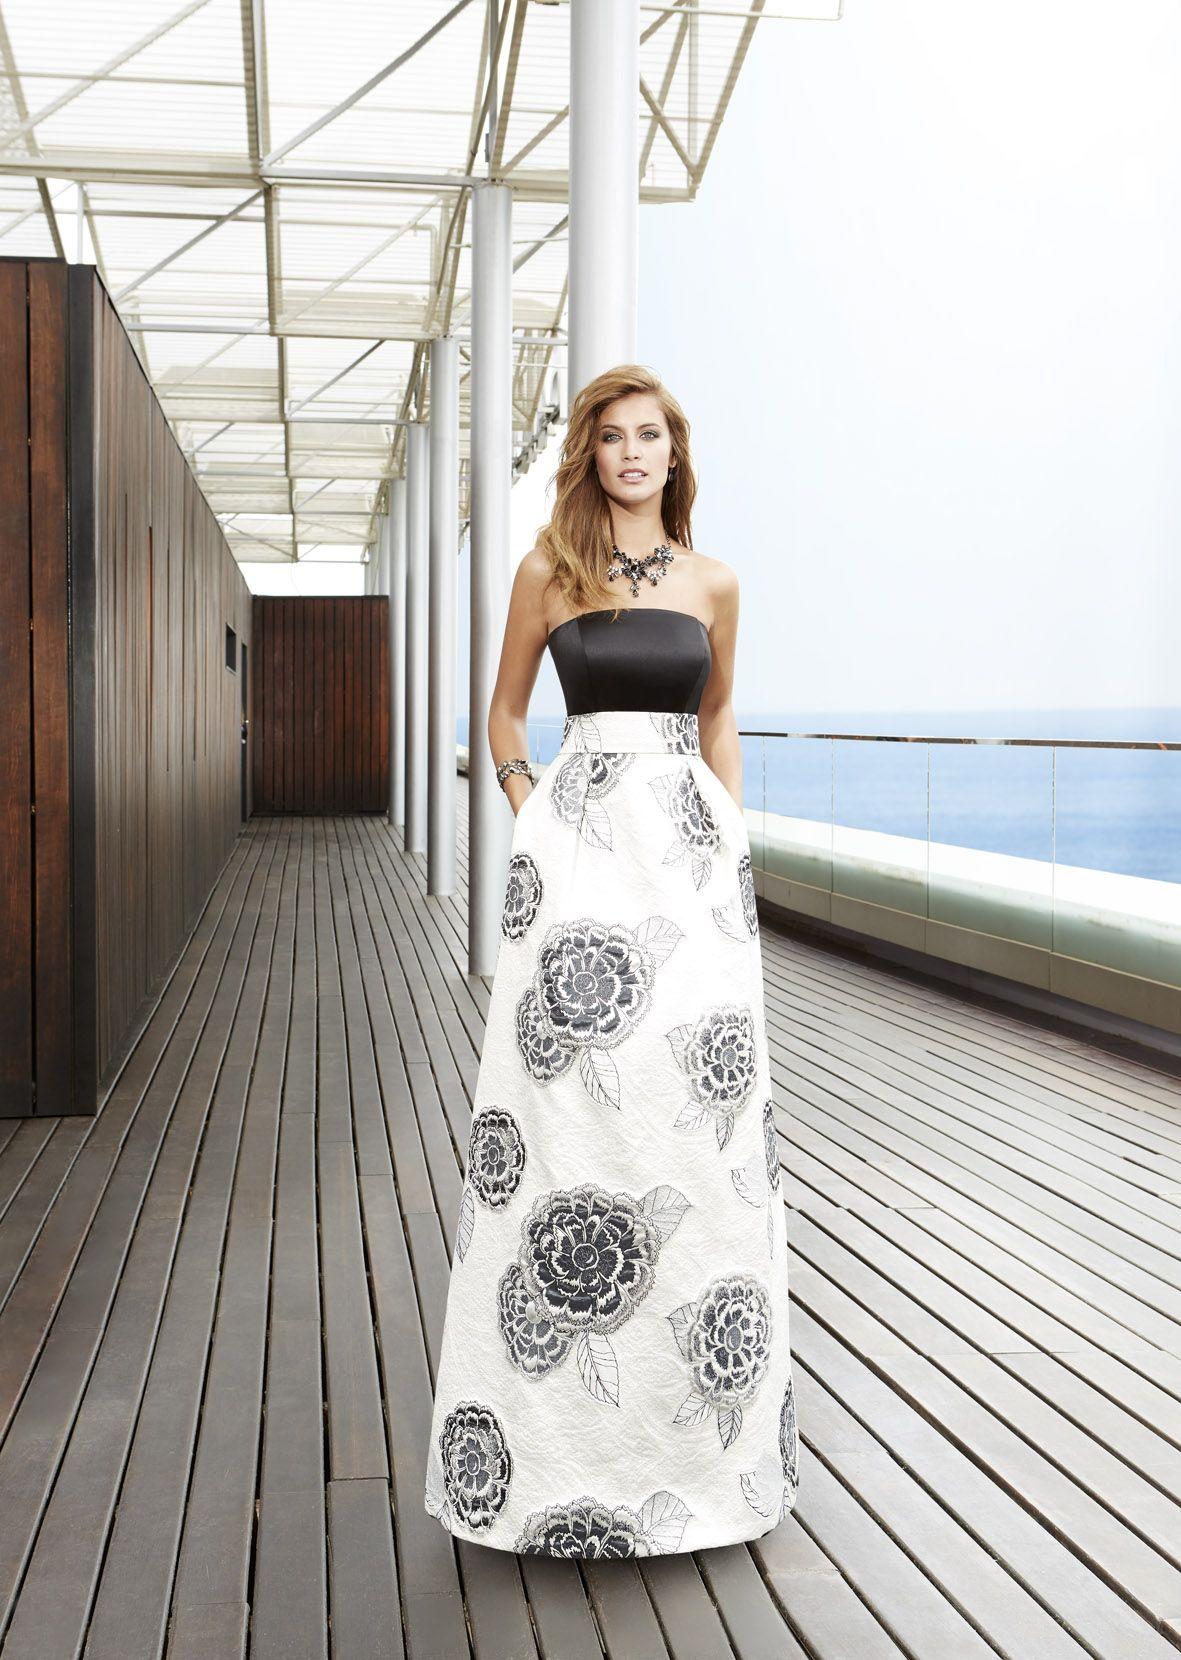 Elegante   moda,de todo un poco   Pinterest   Hochzeiten ...